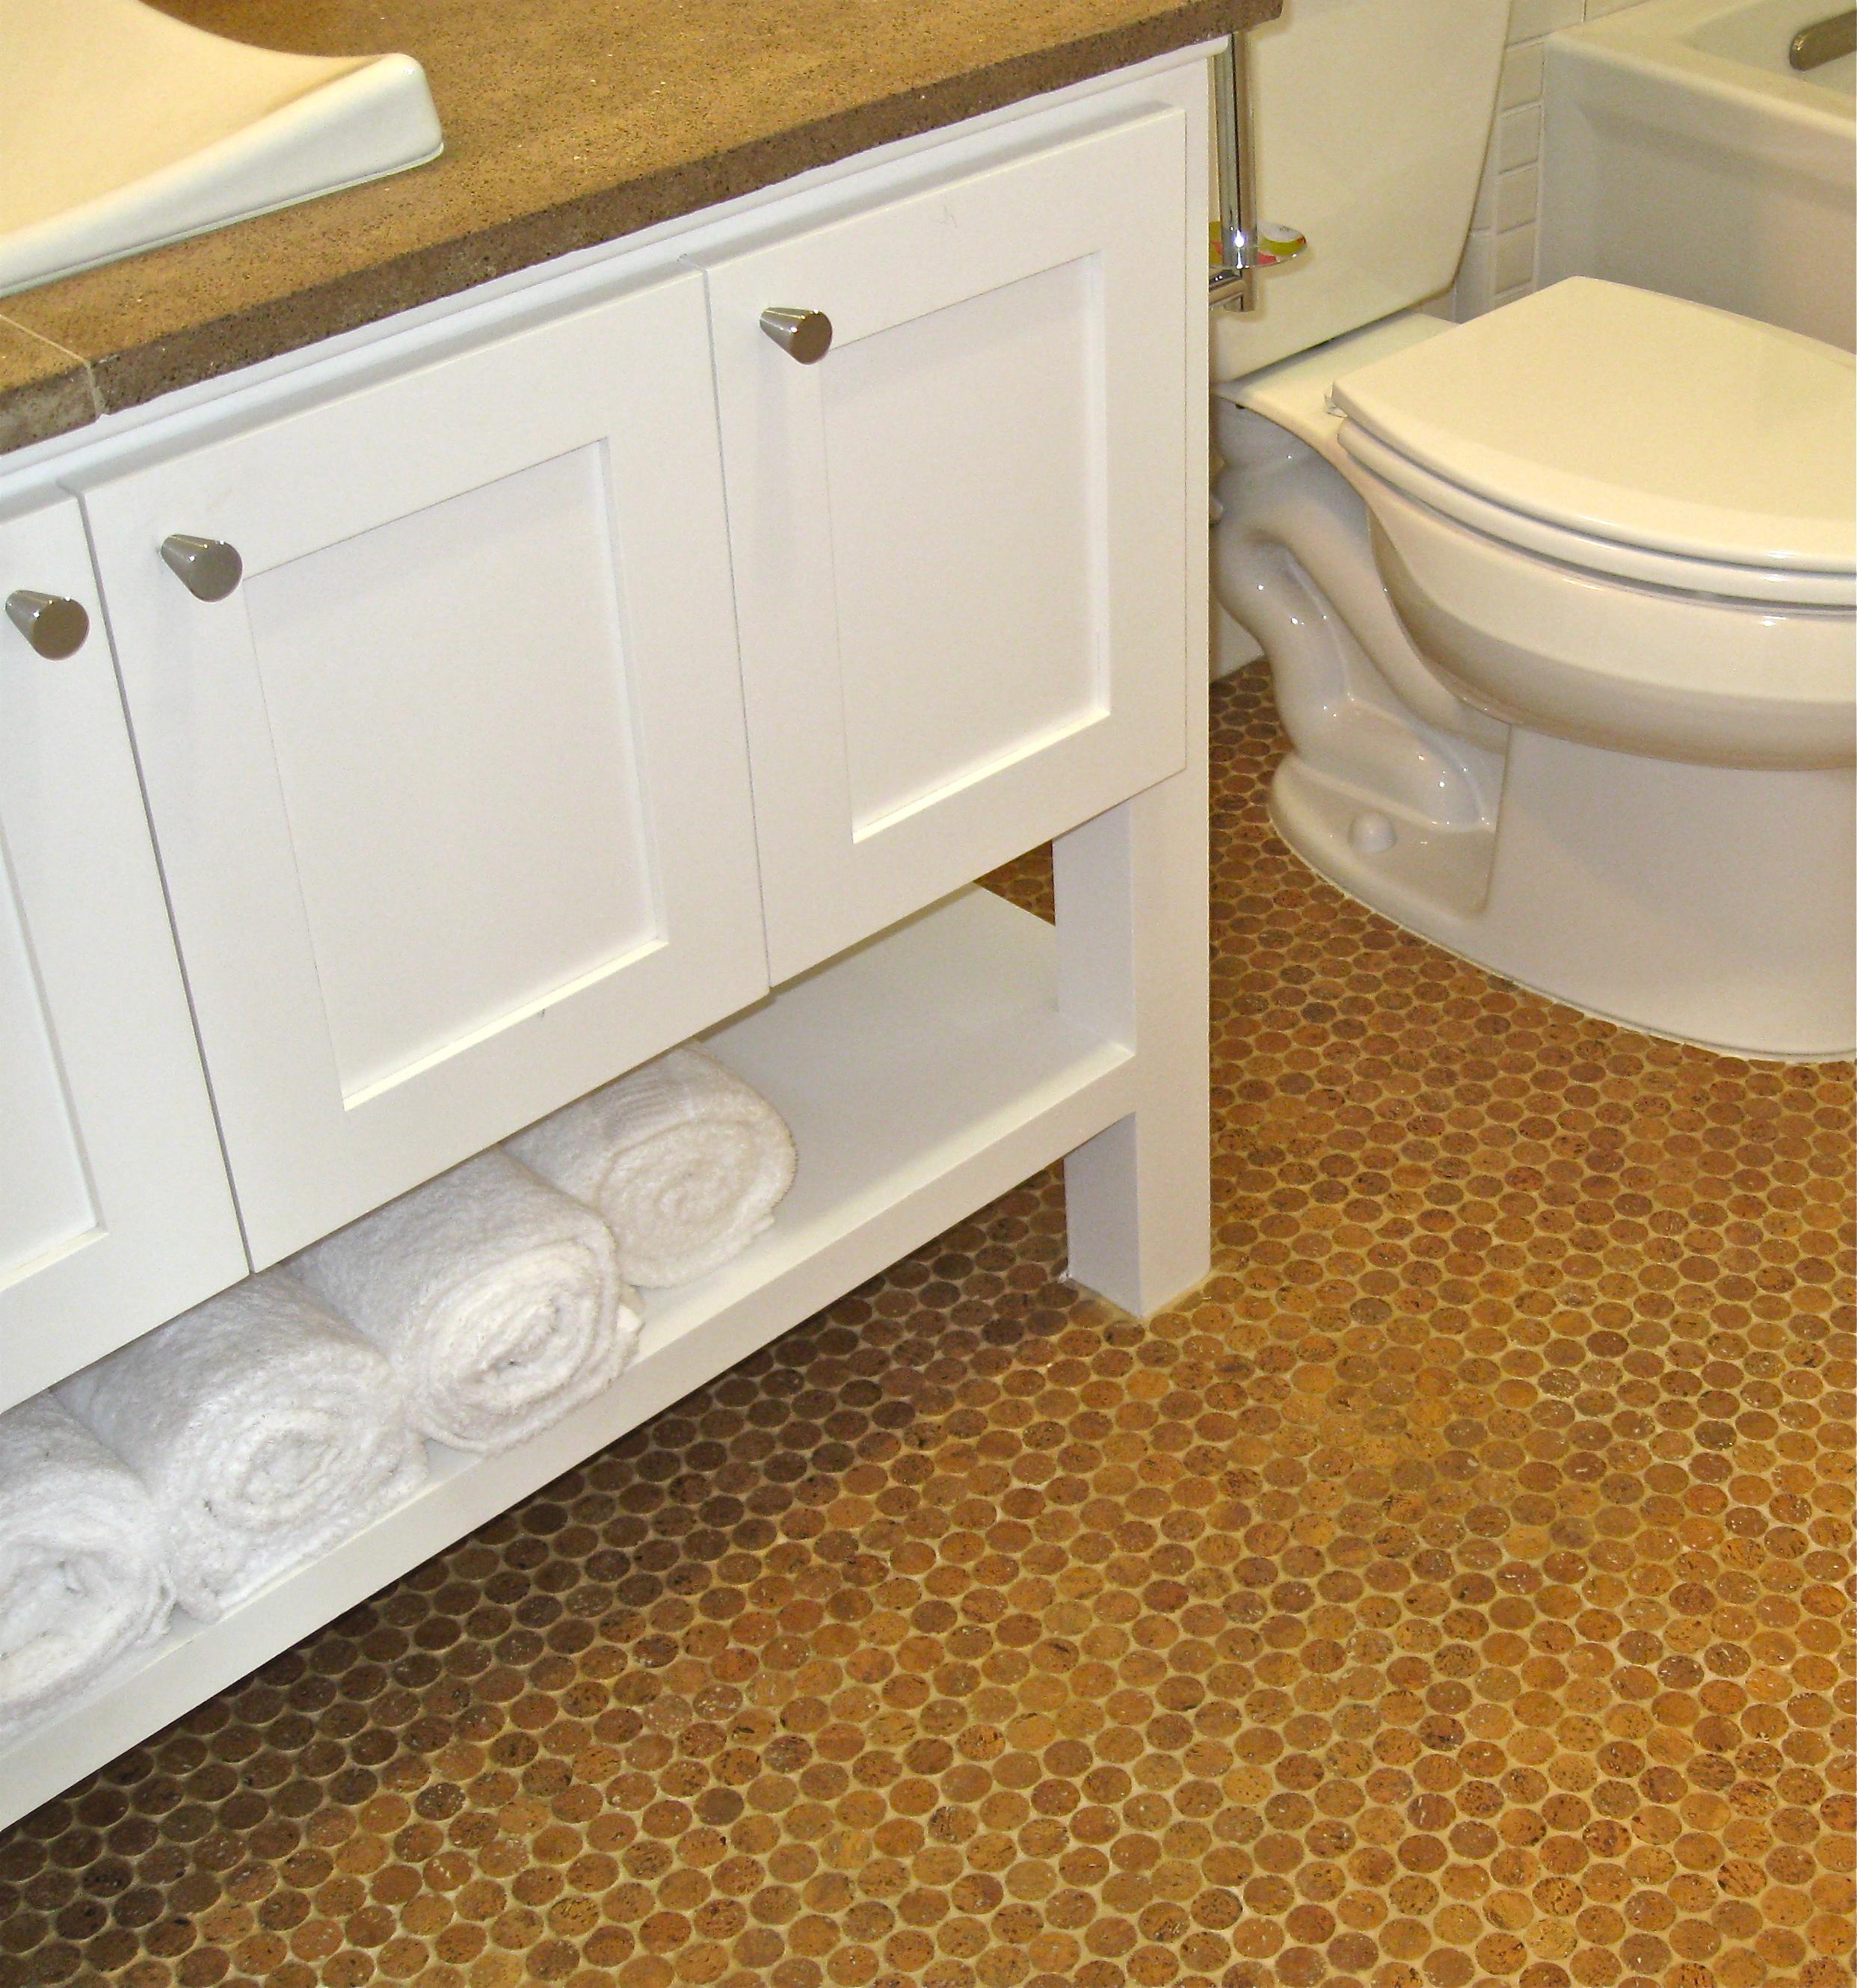 unique cork flooring tiles brown cork flooring in bathroom flooring ideas cork flooring tiles